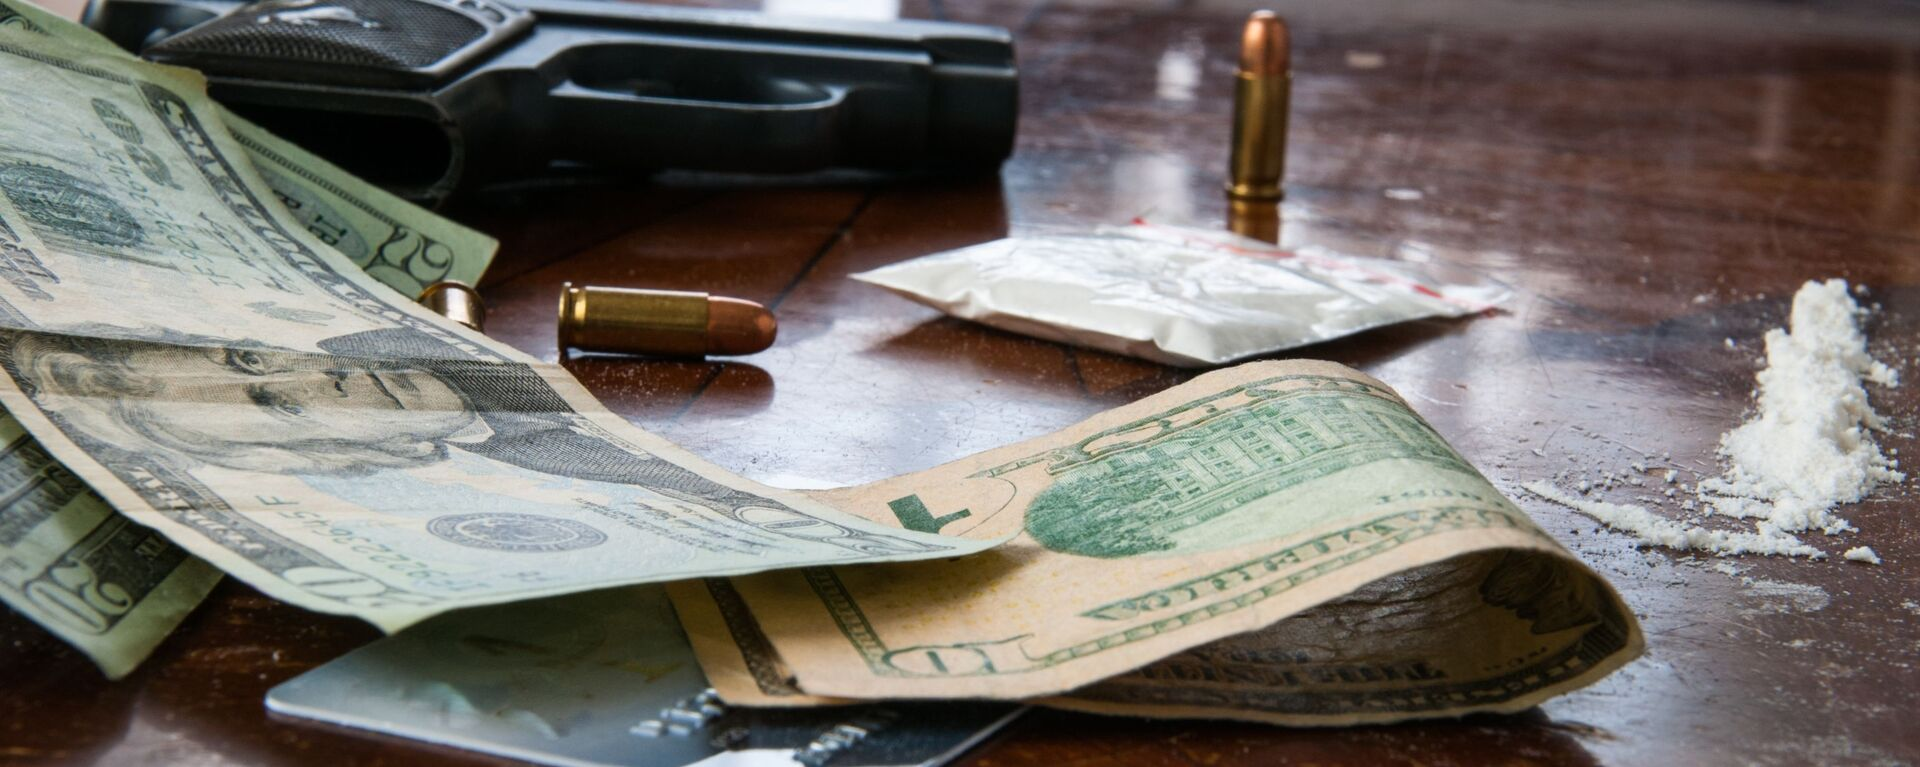 Cocaína, dólares y balas - Sputnik Mundo, 1920, 15.07.2019